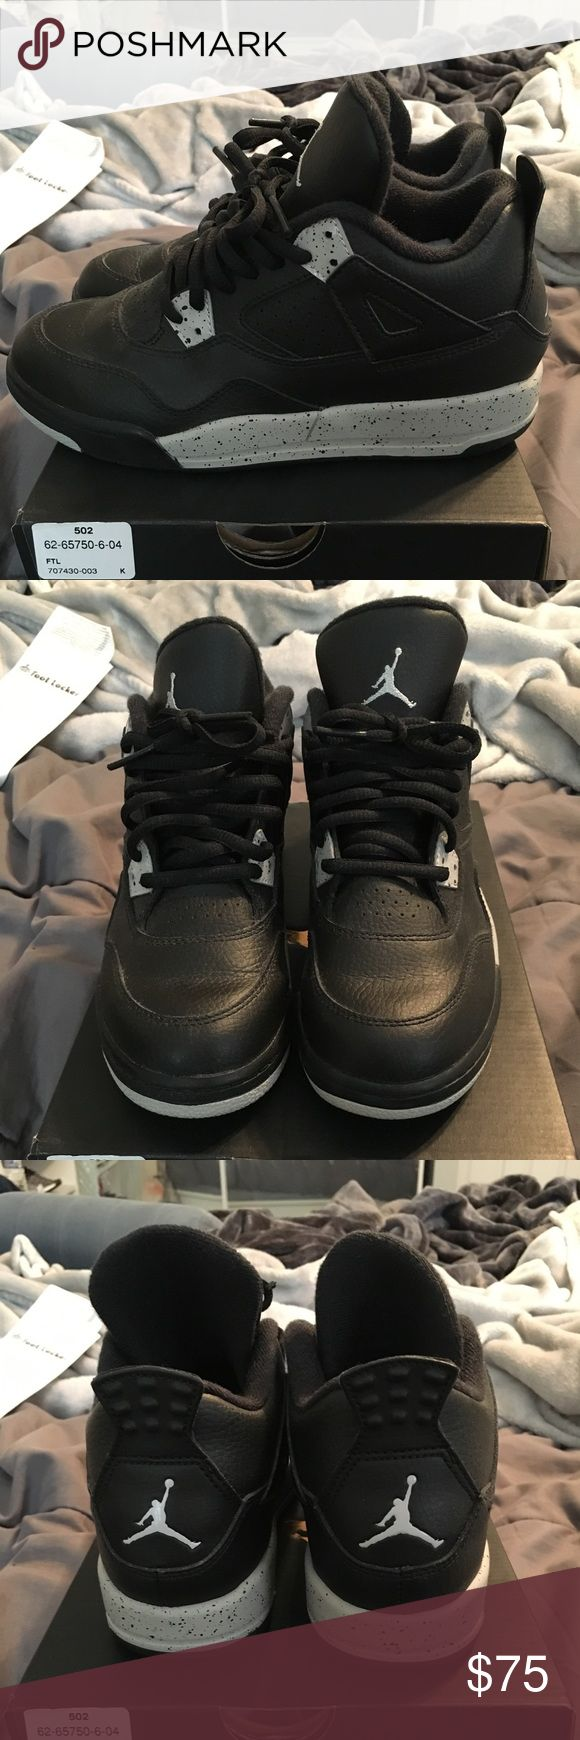 Jordan Retro 4 Oreo Adult worn size 3Y Air Jordan Shoes Sneakers